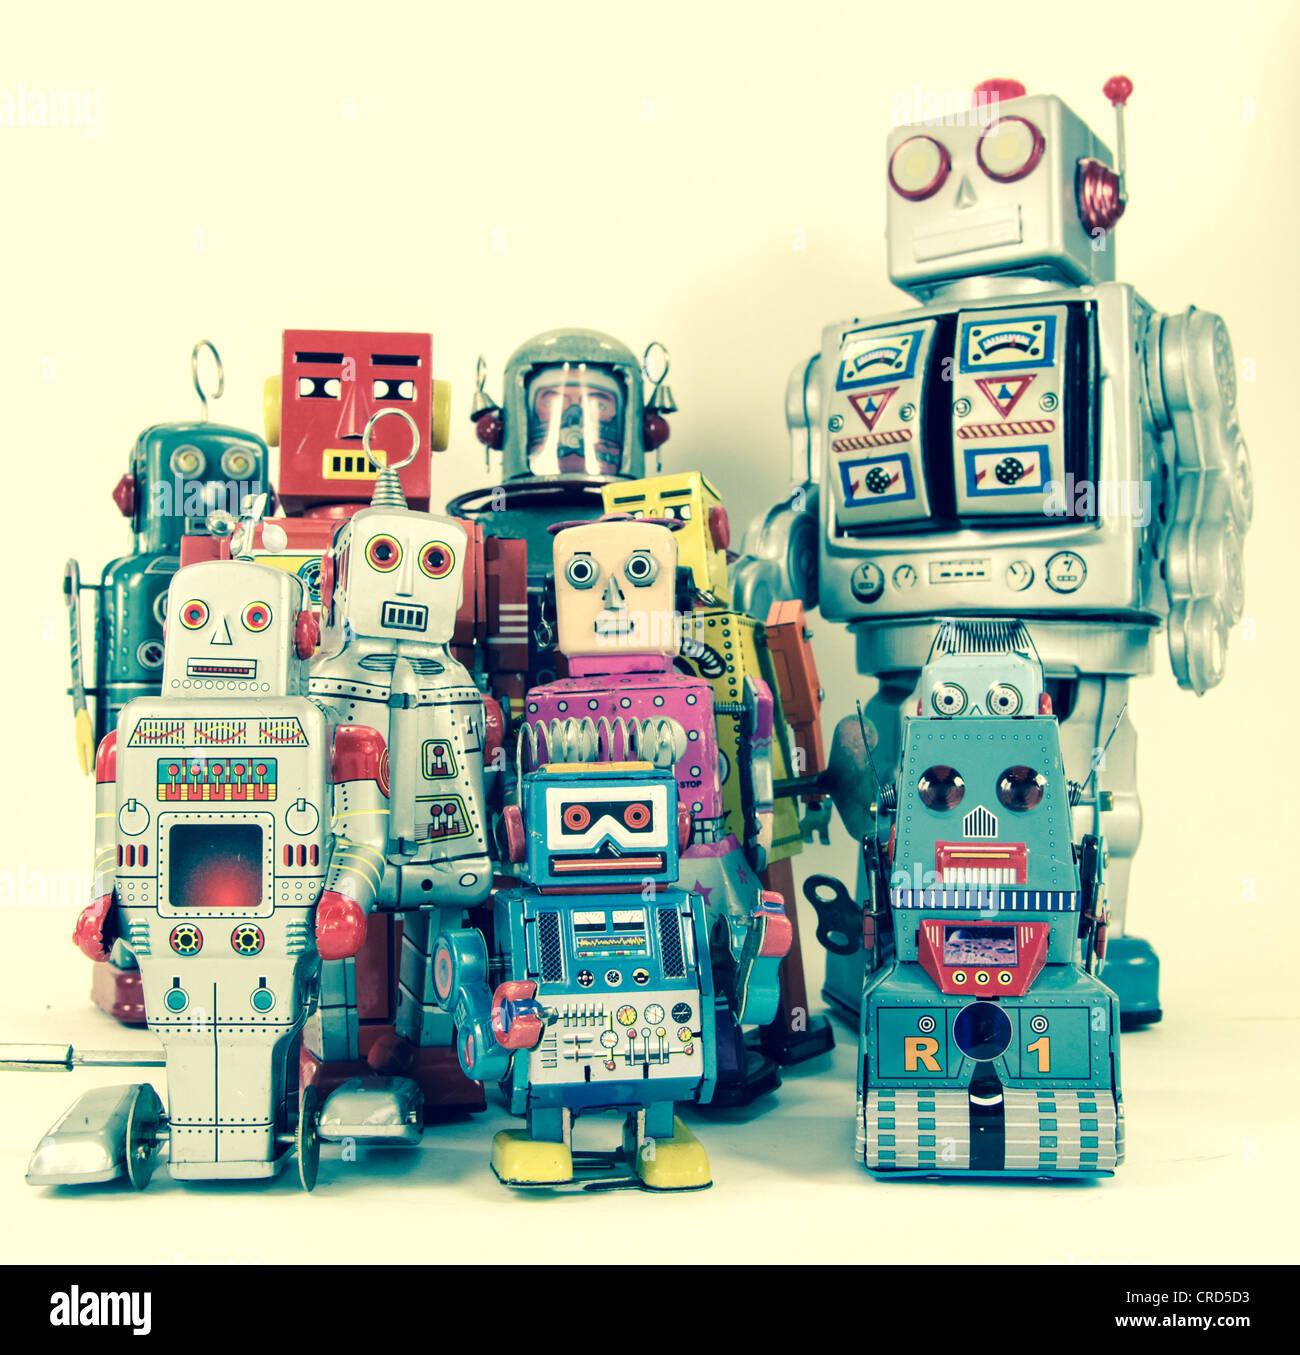 a robot toys - Stock Image